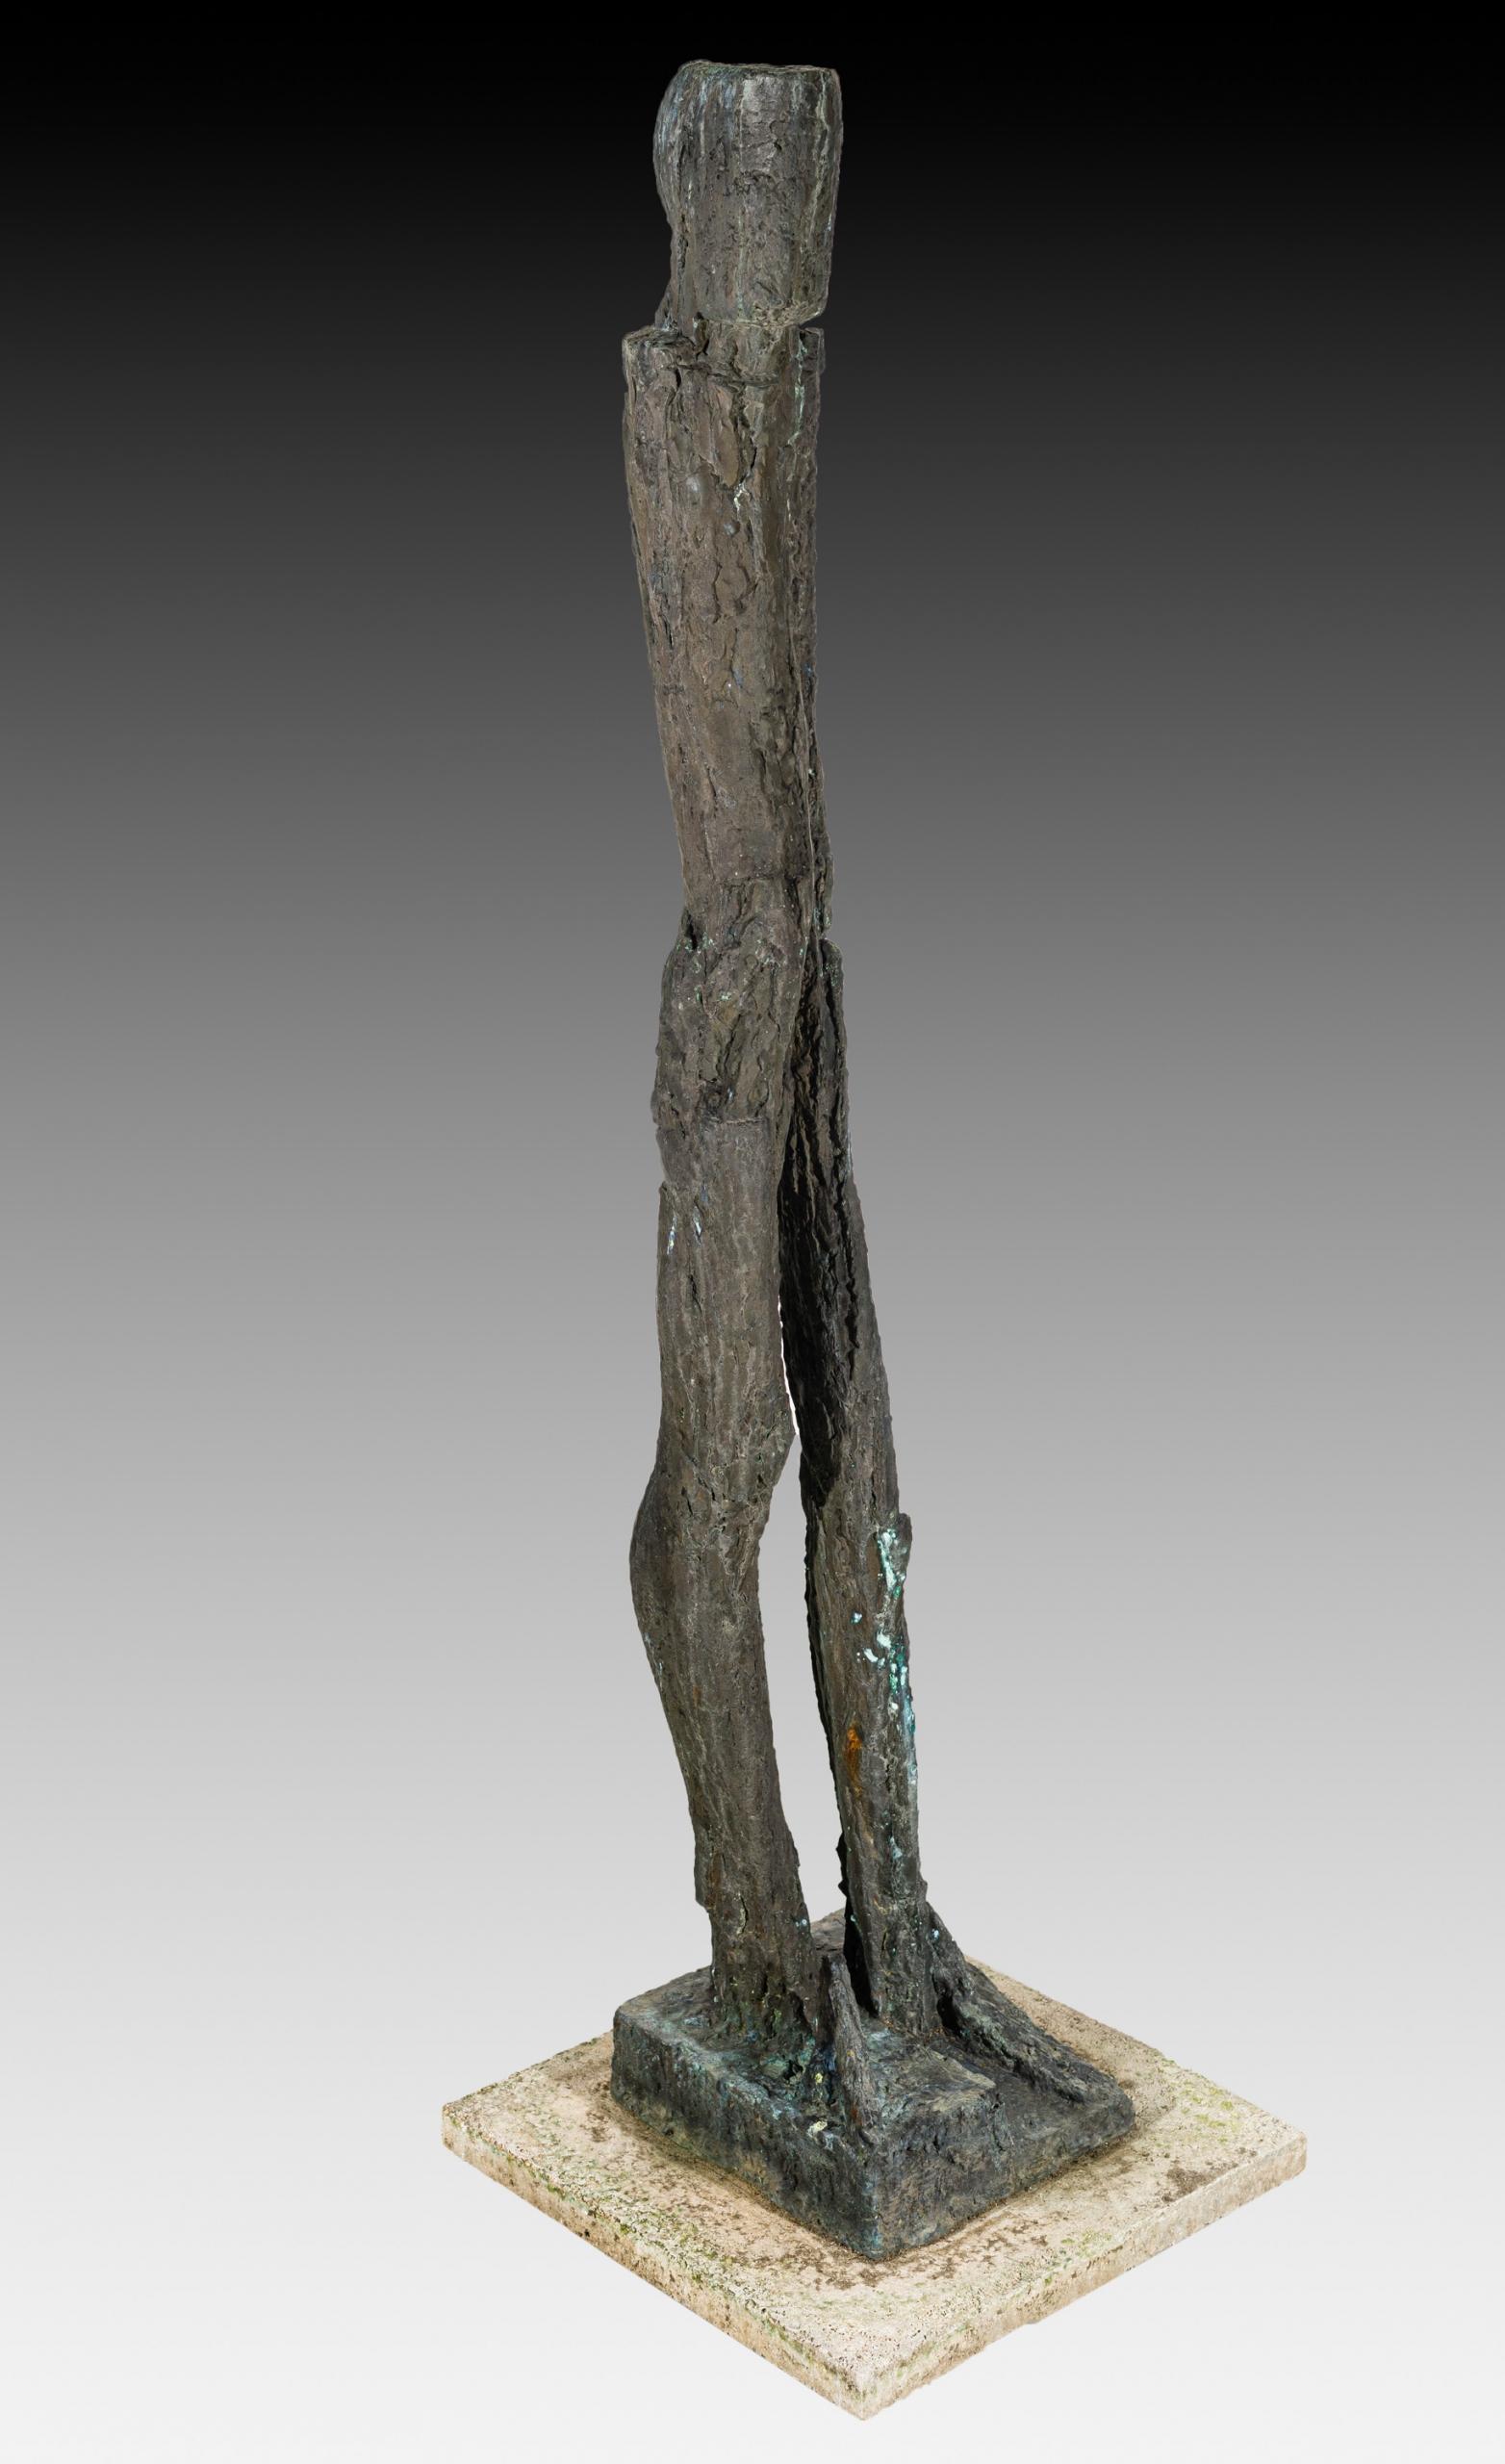 Paul Louis Meier, Stehende Figur